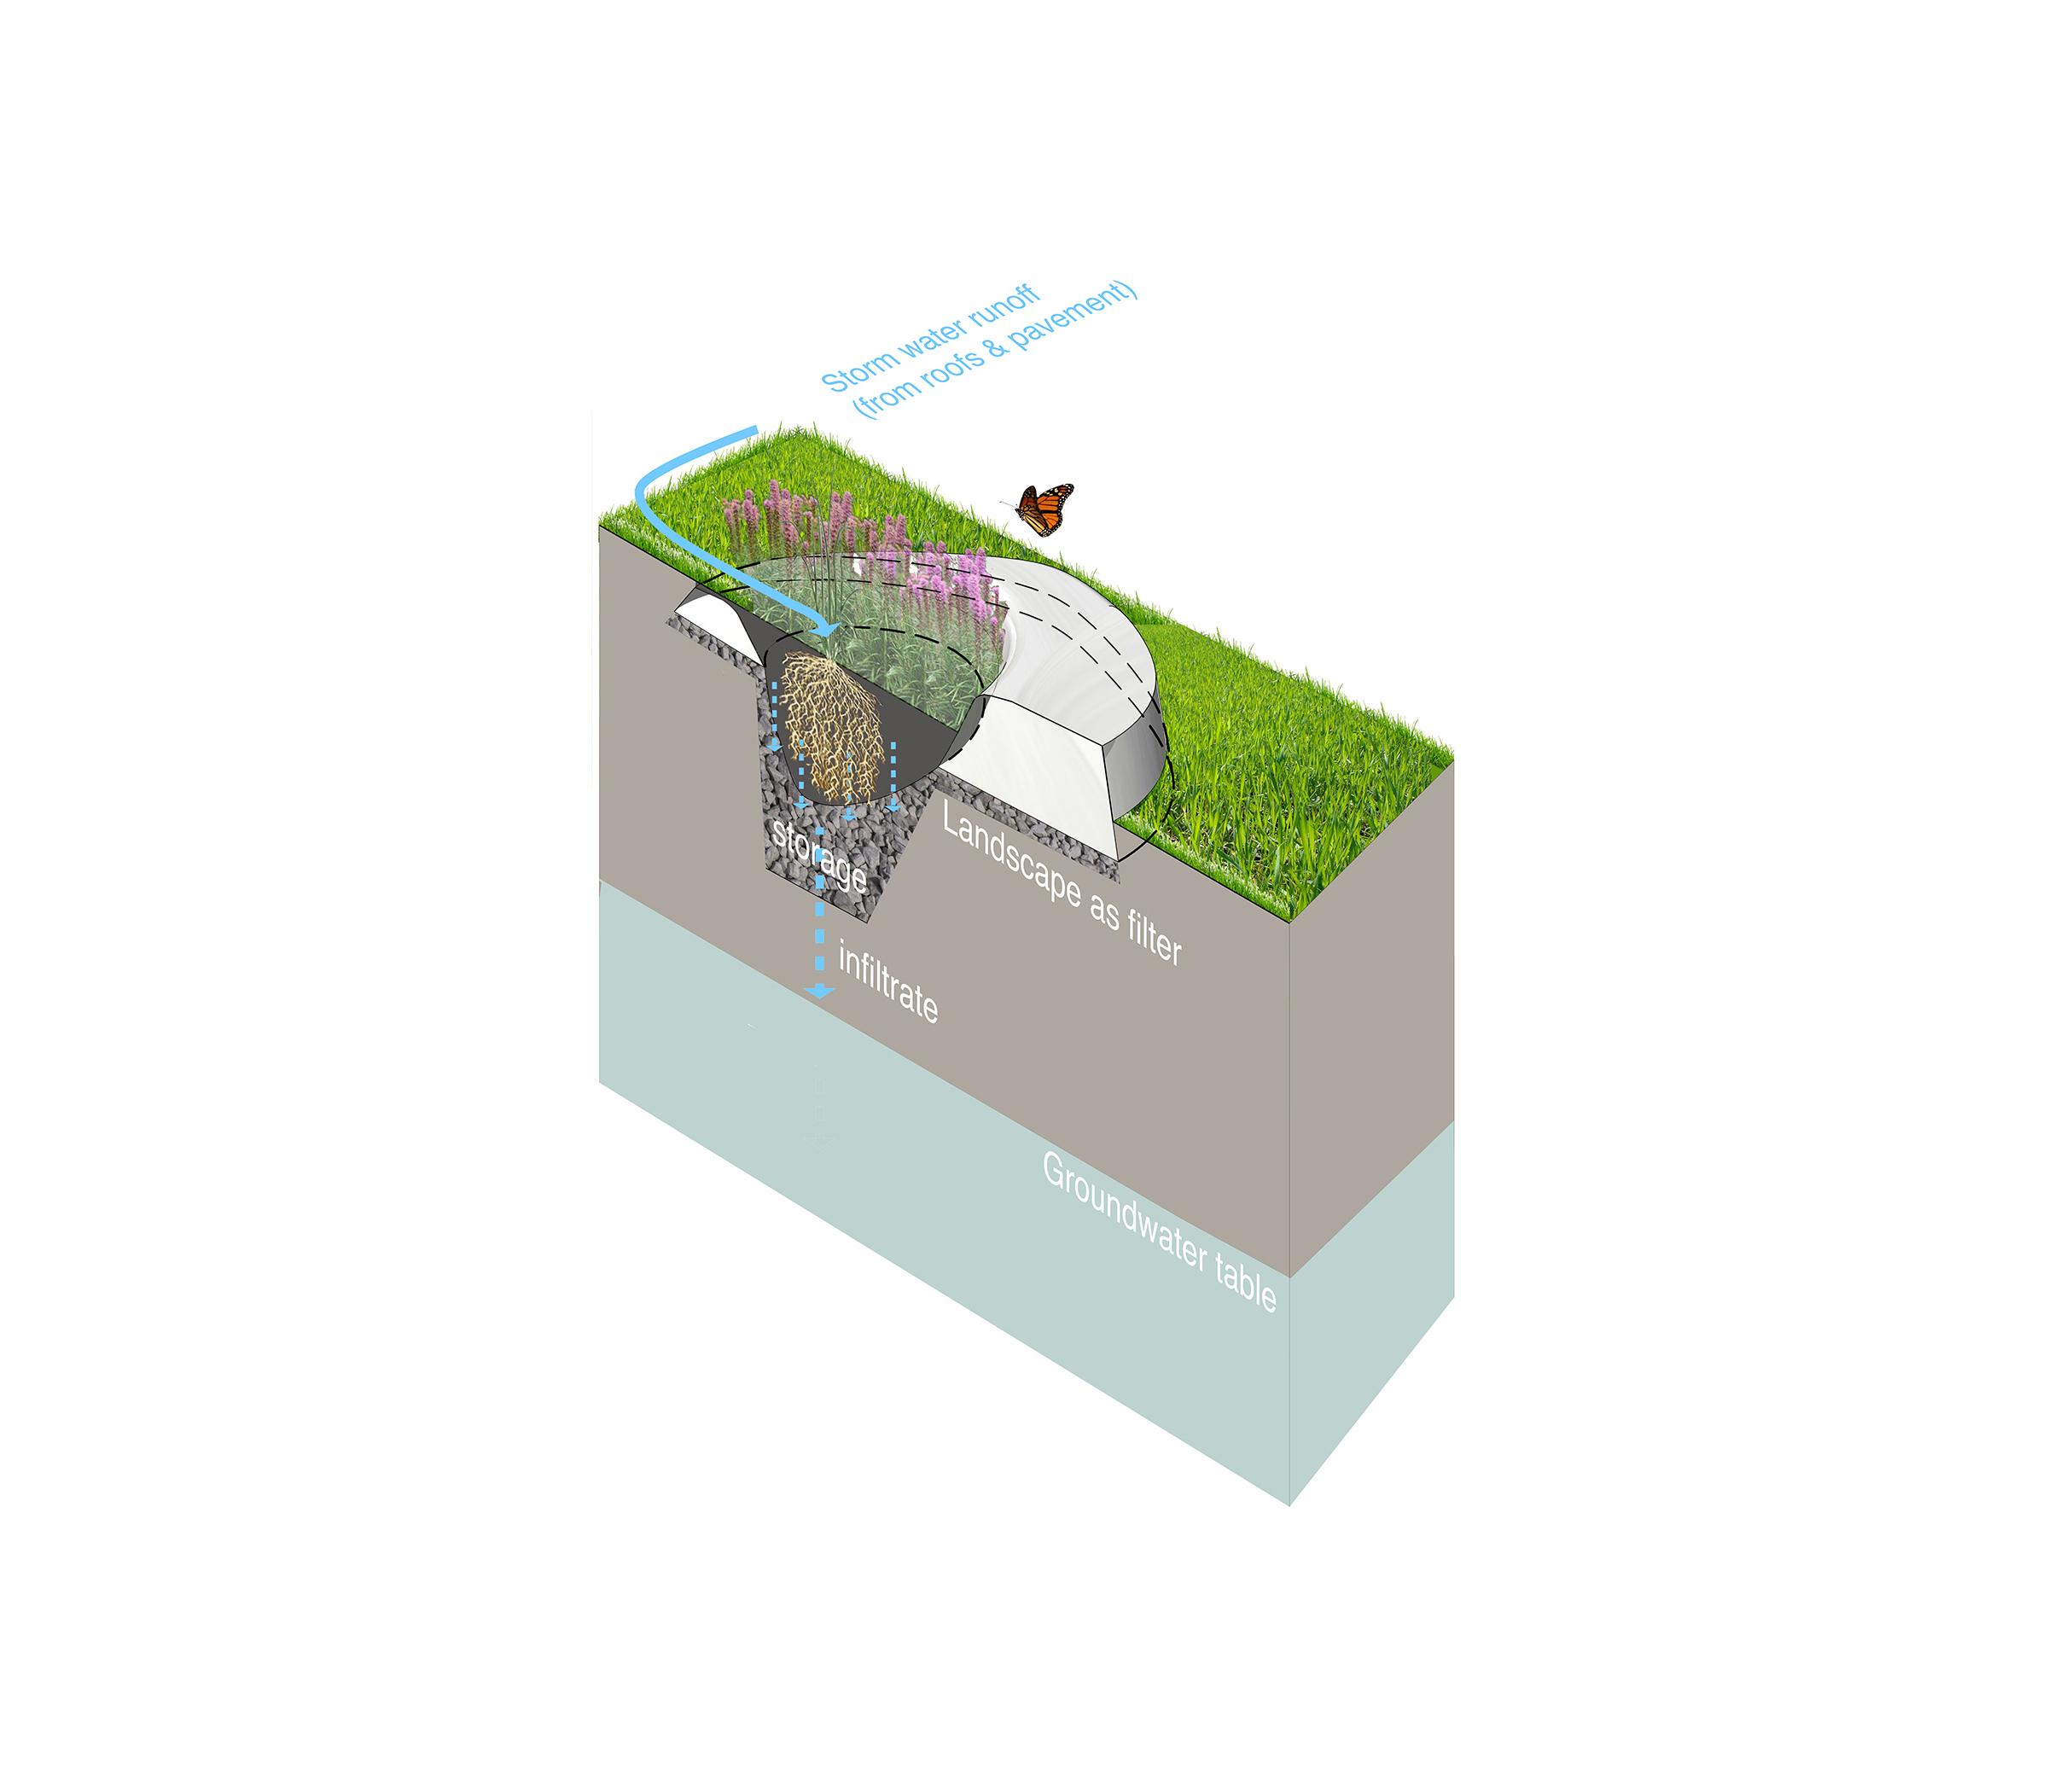 Diagram-Section-Perspective-rev-3.jpg